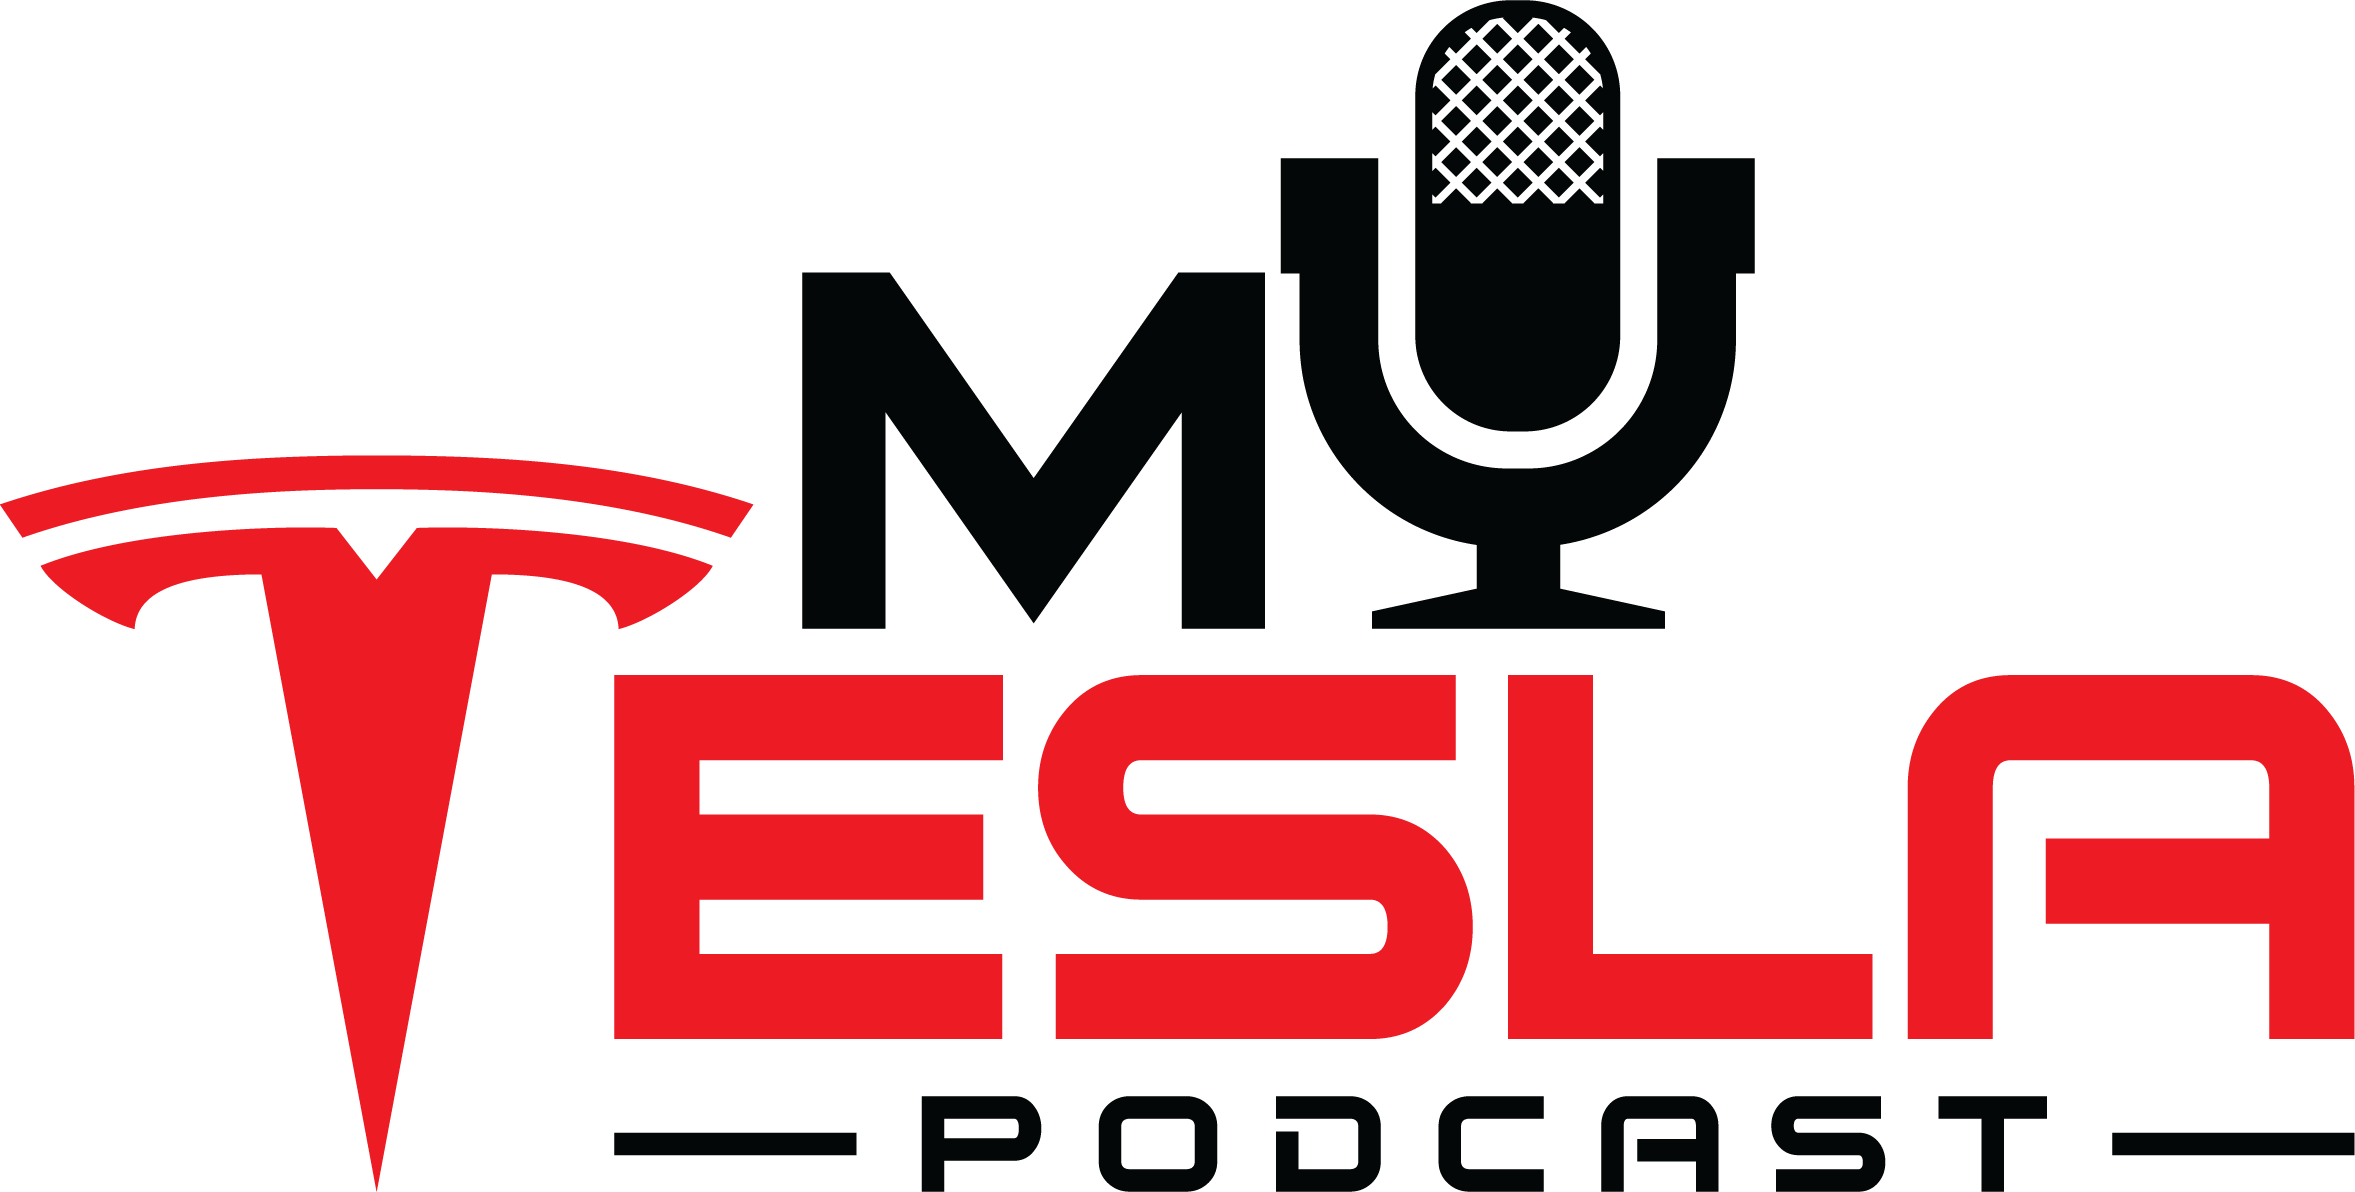 Tesla themed Podcast Logo